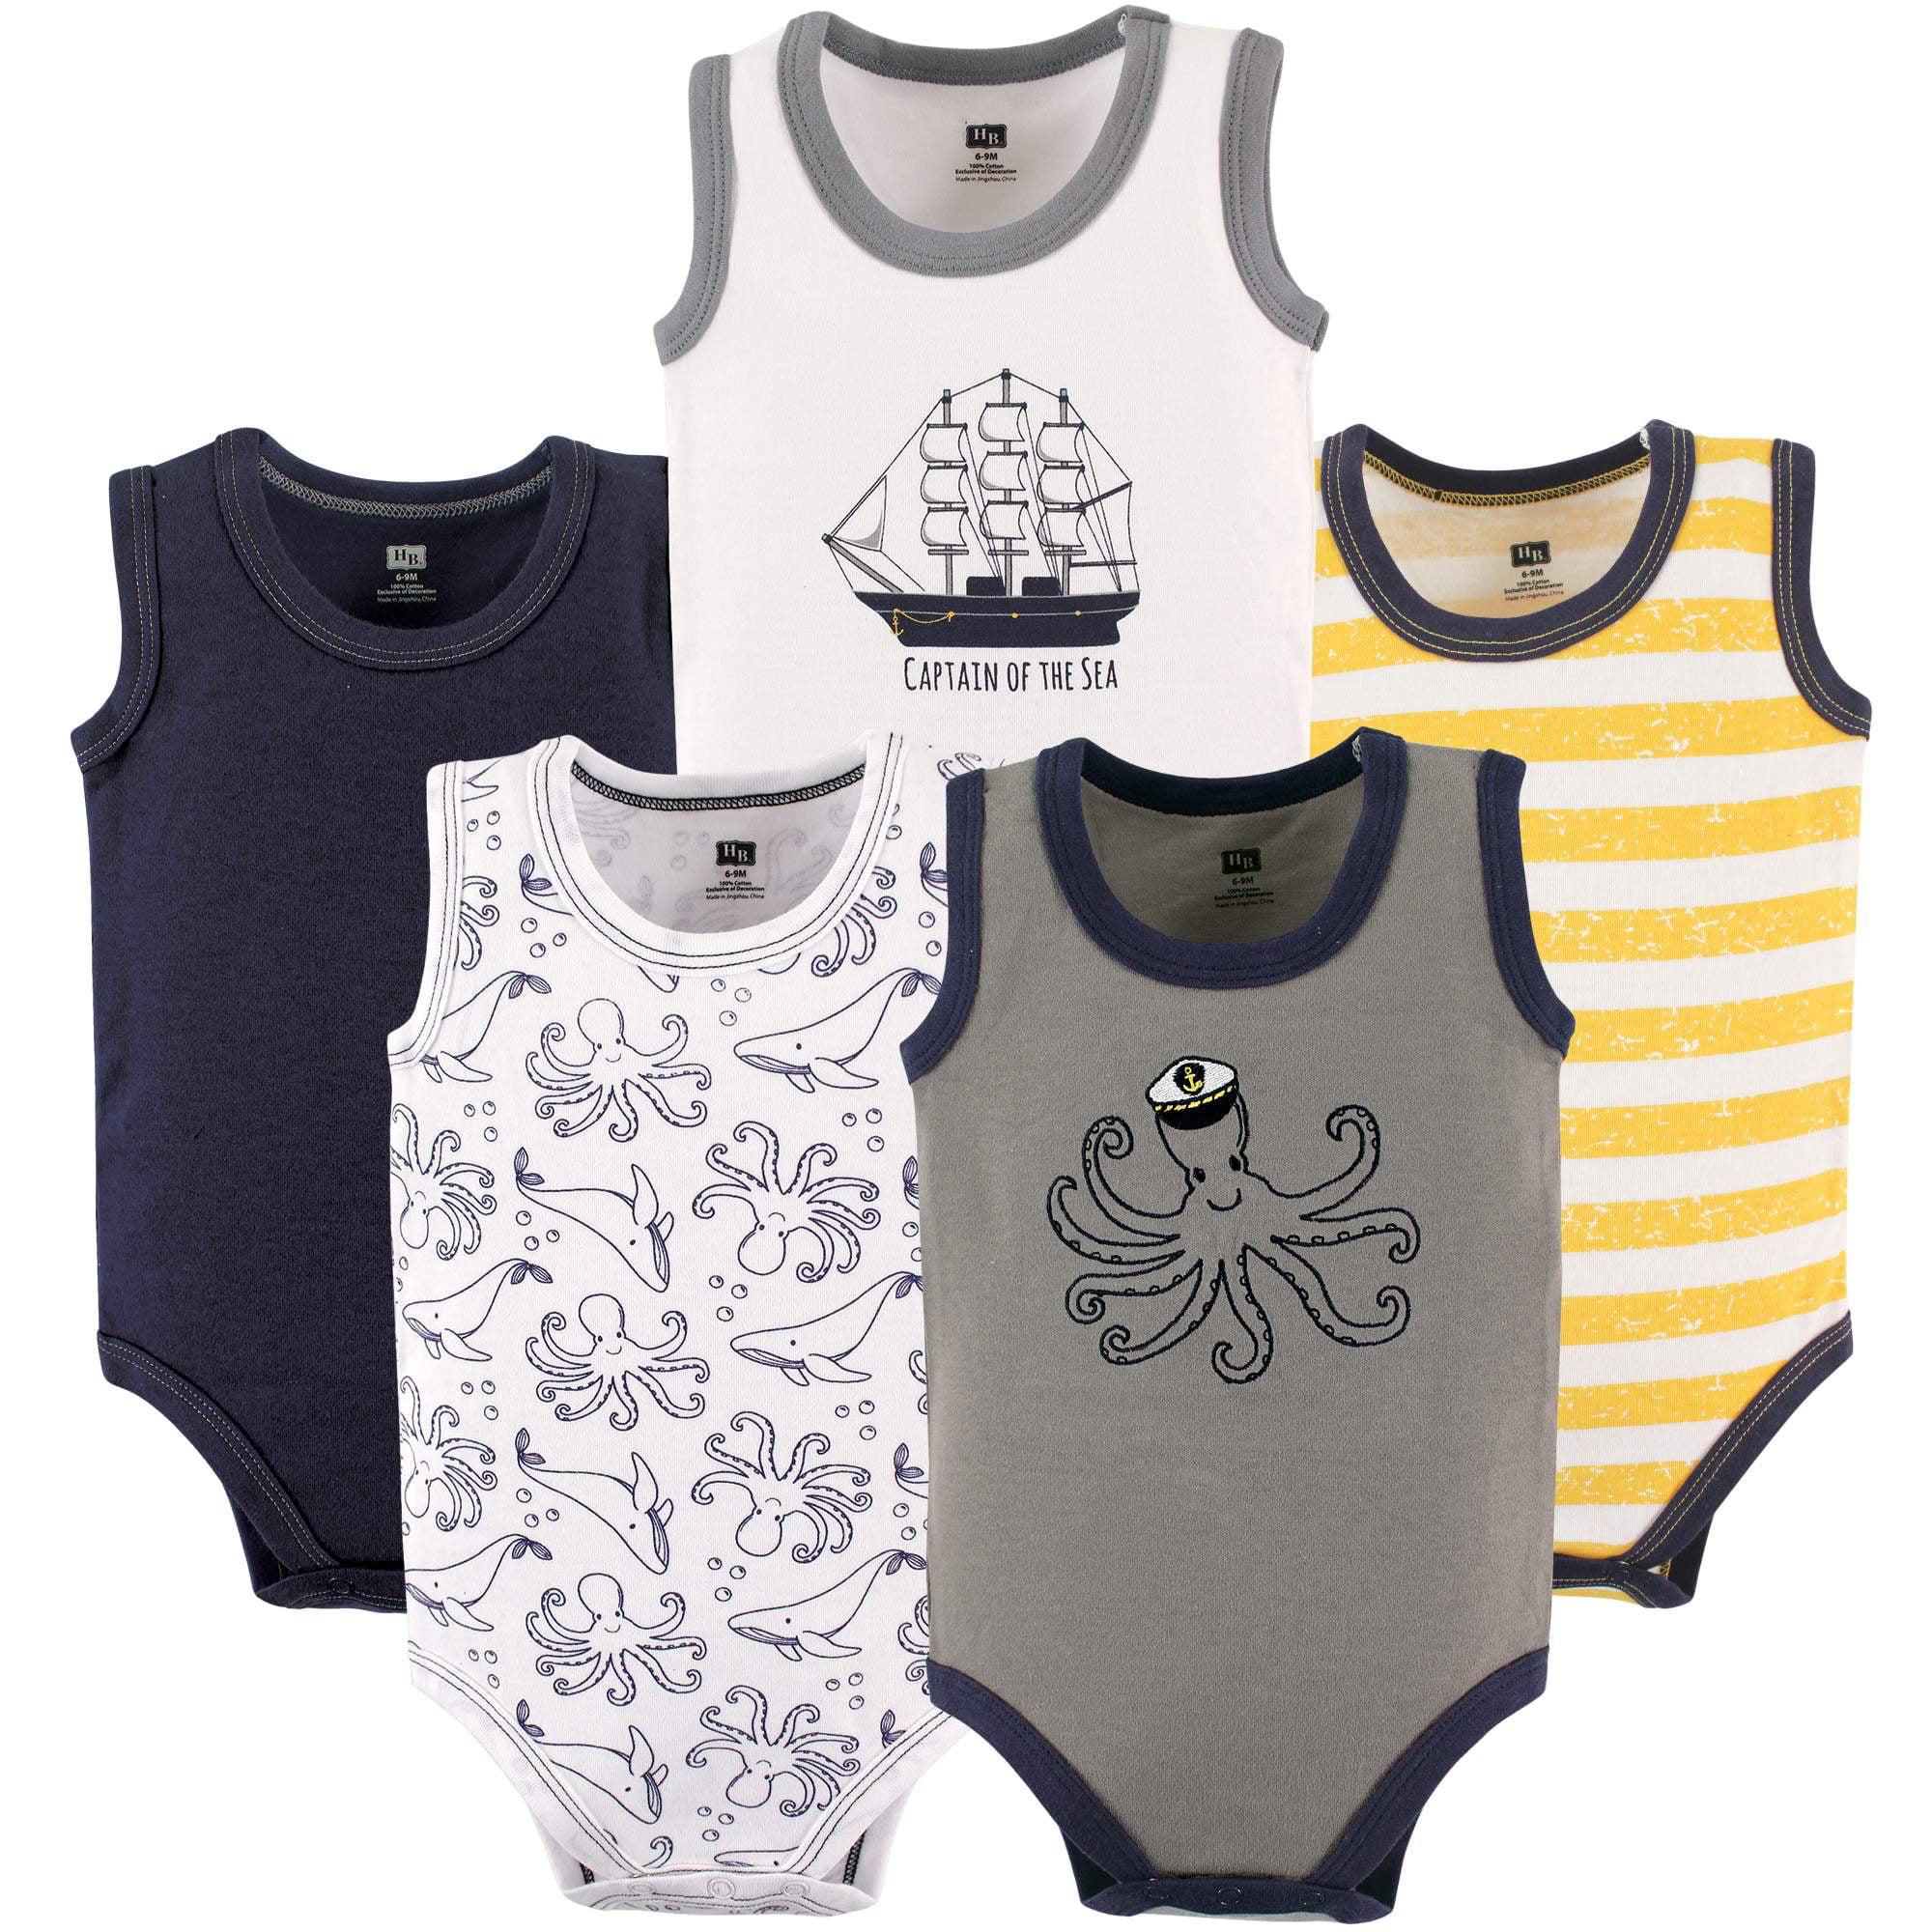 Essentials Boys Baby 6-Pack Sleeveless Bodysuits